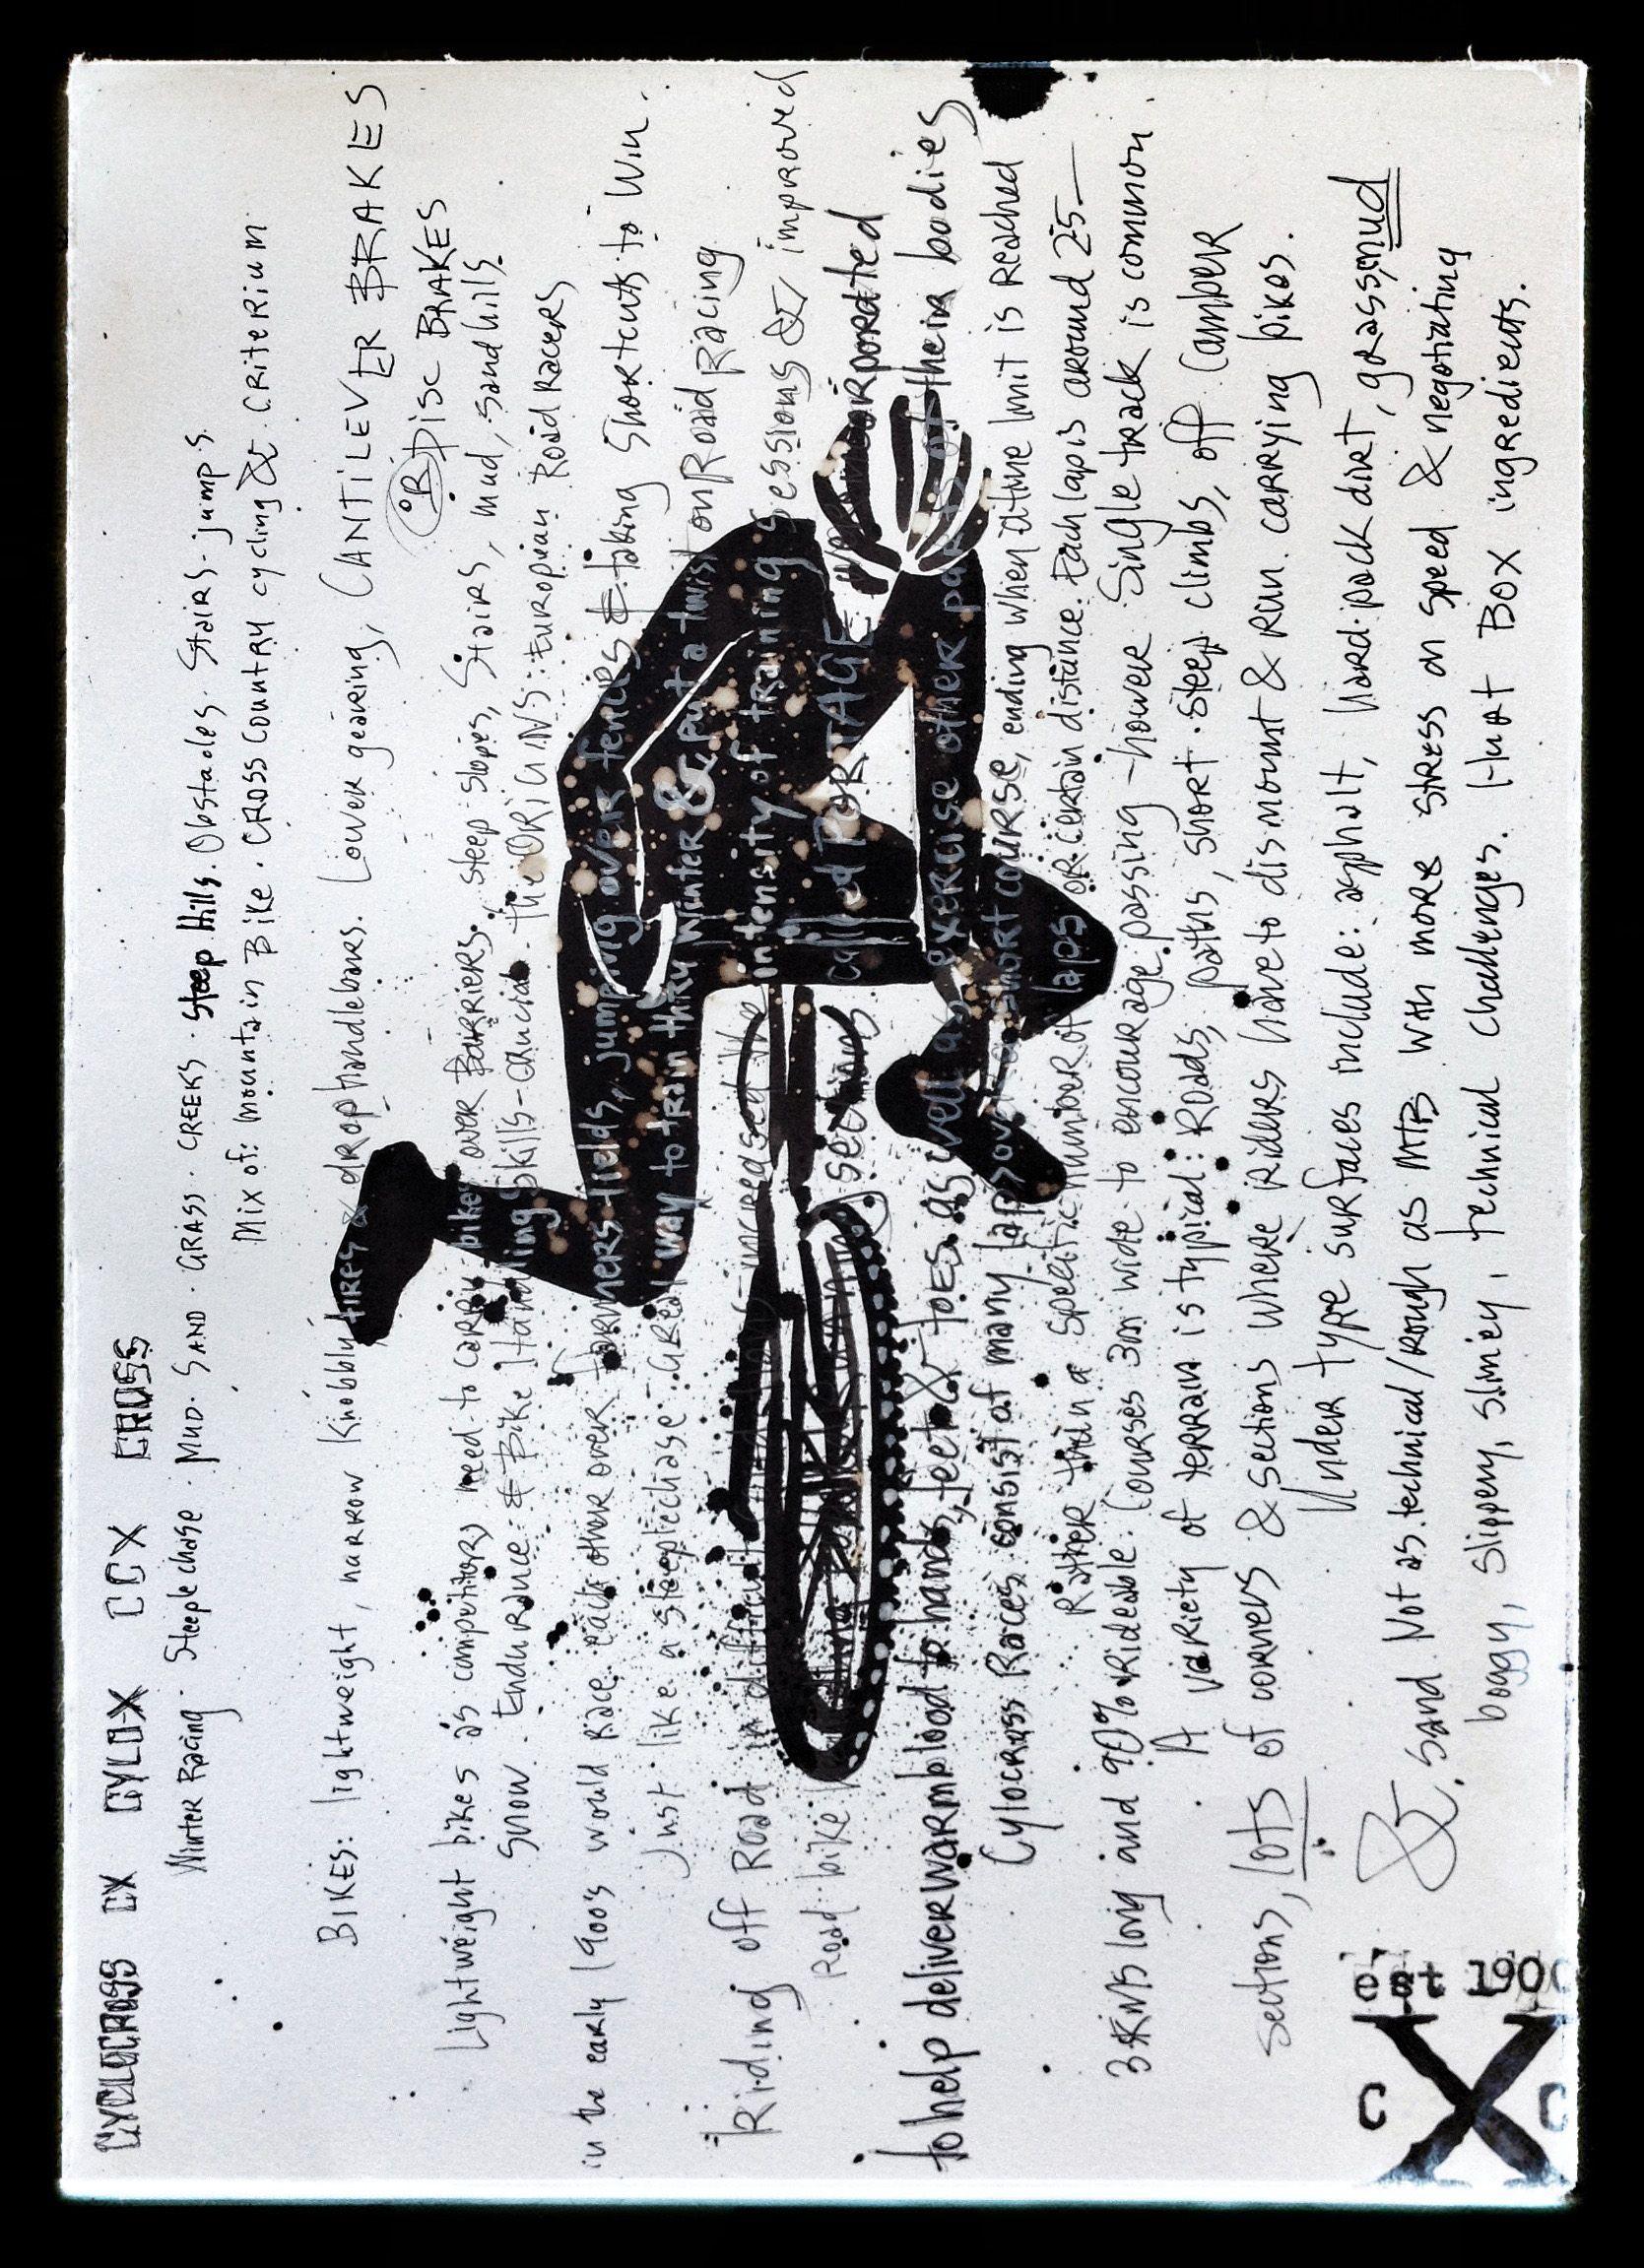 Ink & bleach on paper sketch. www.cycologygear.com